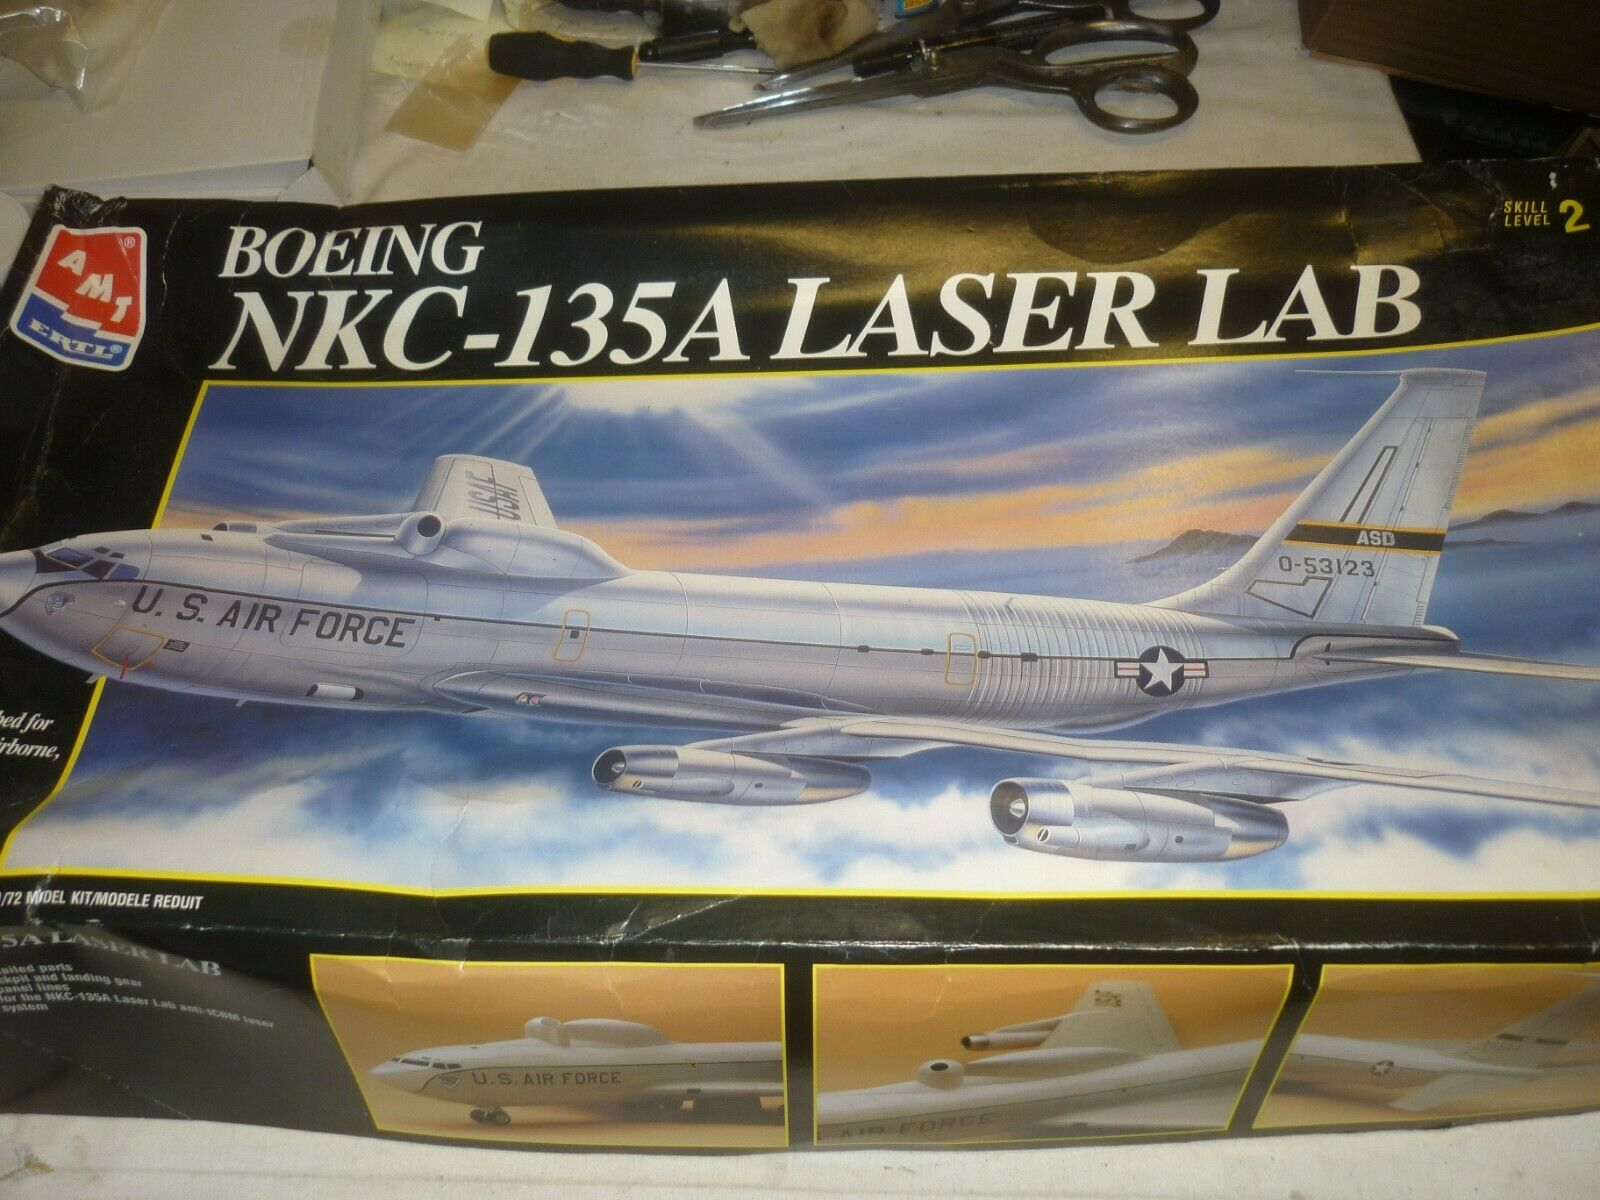 AMT ERTL un built plastic kit of a Boeing NKC 135A Laser lab,  boxed